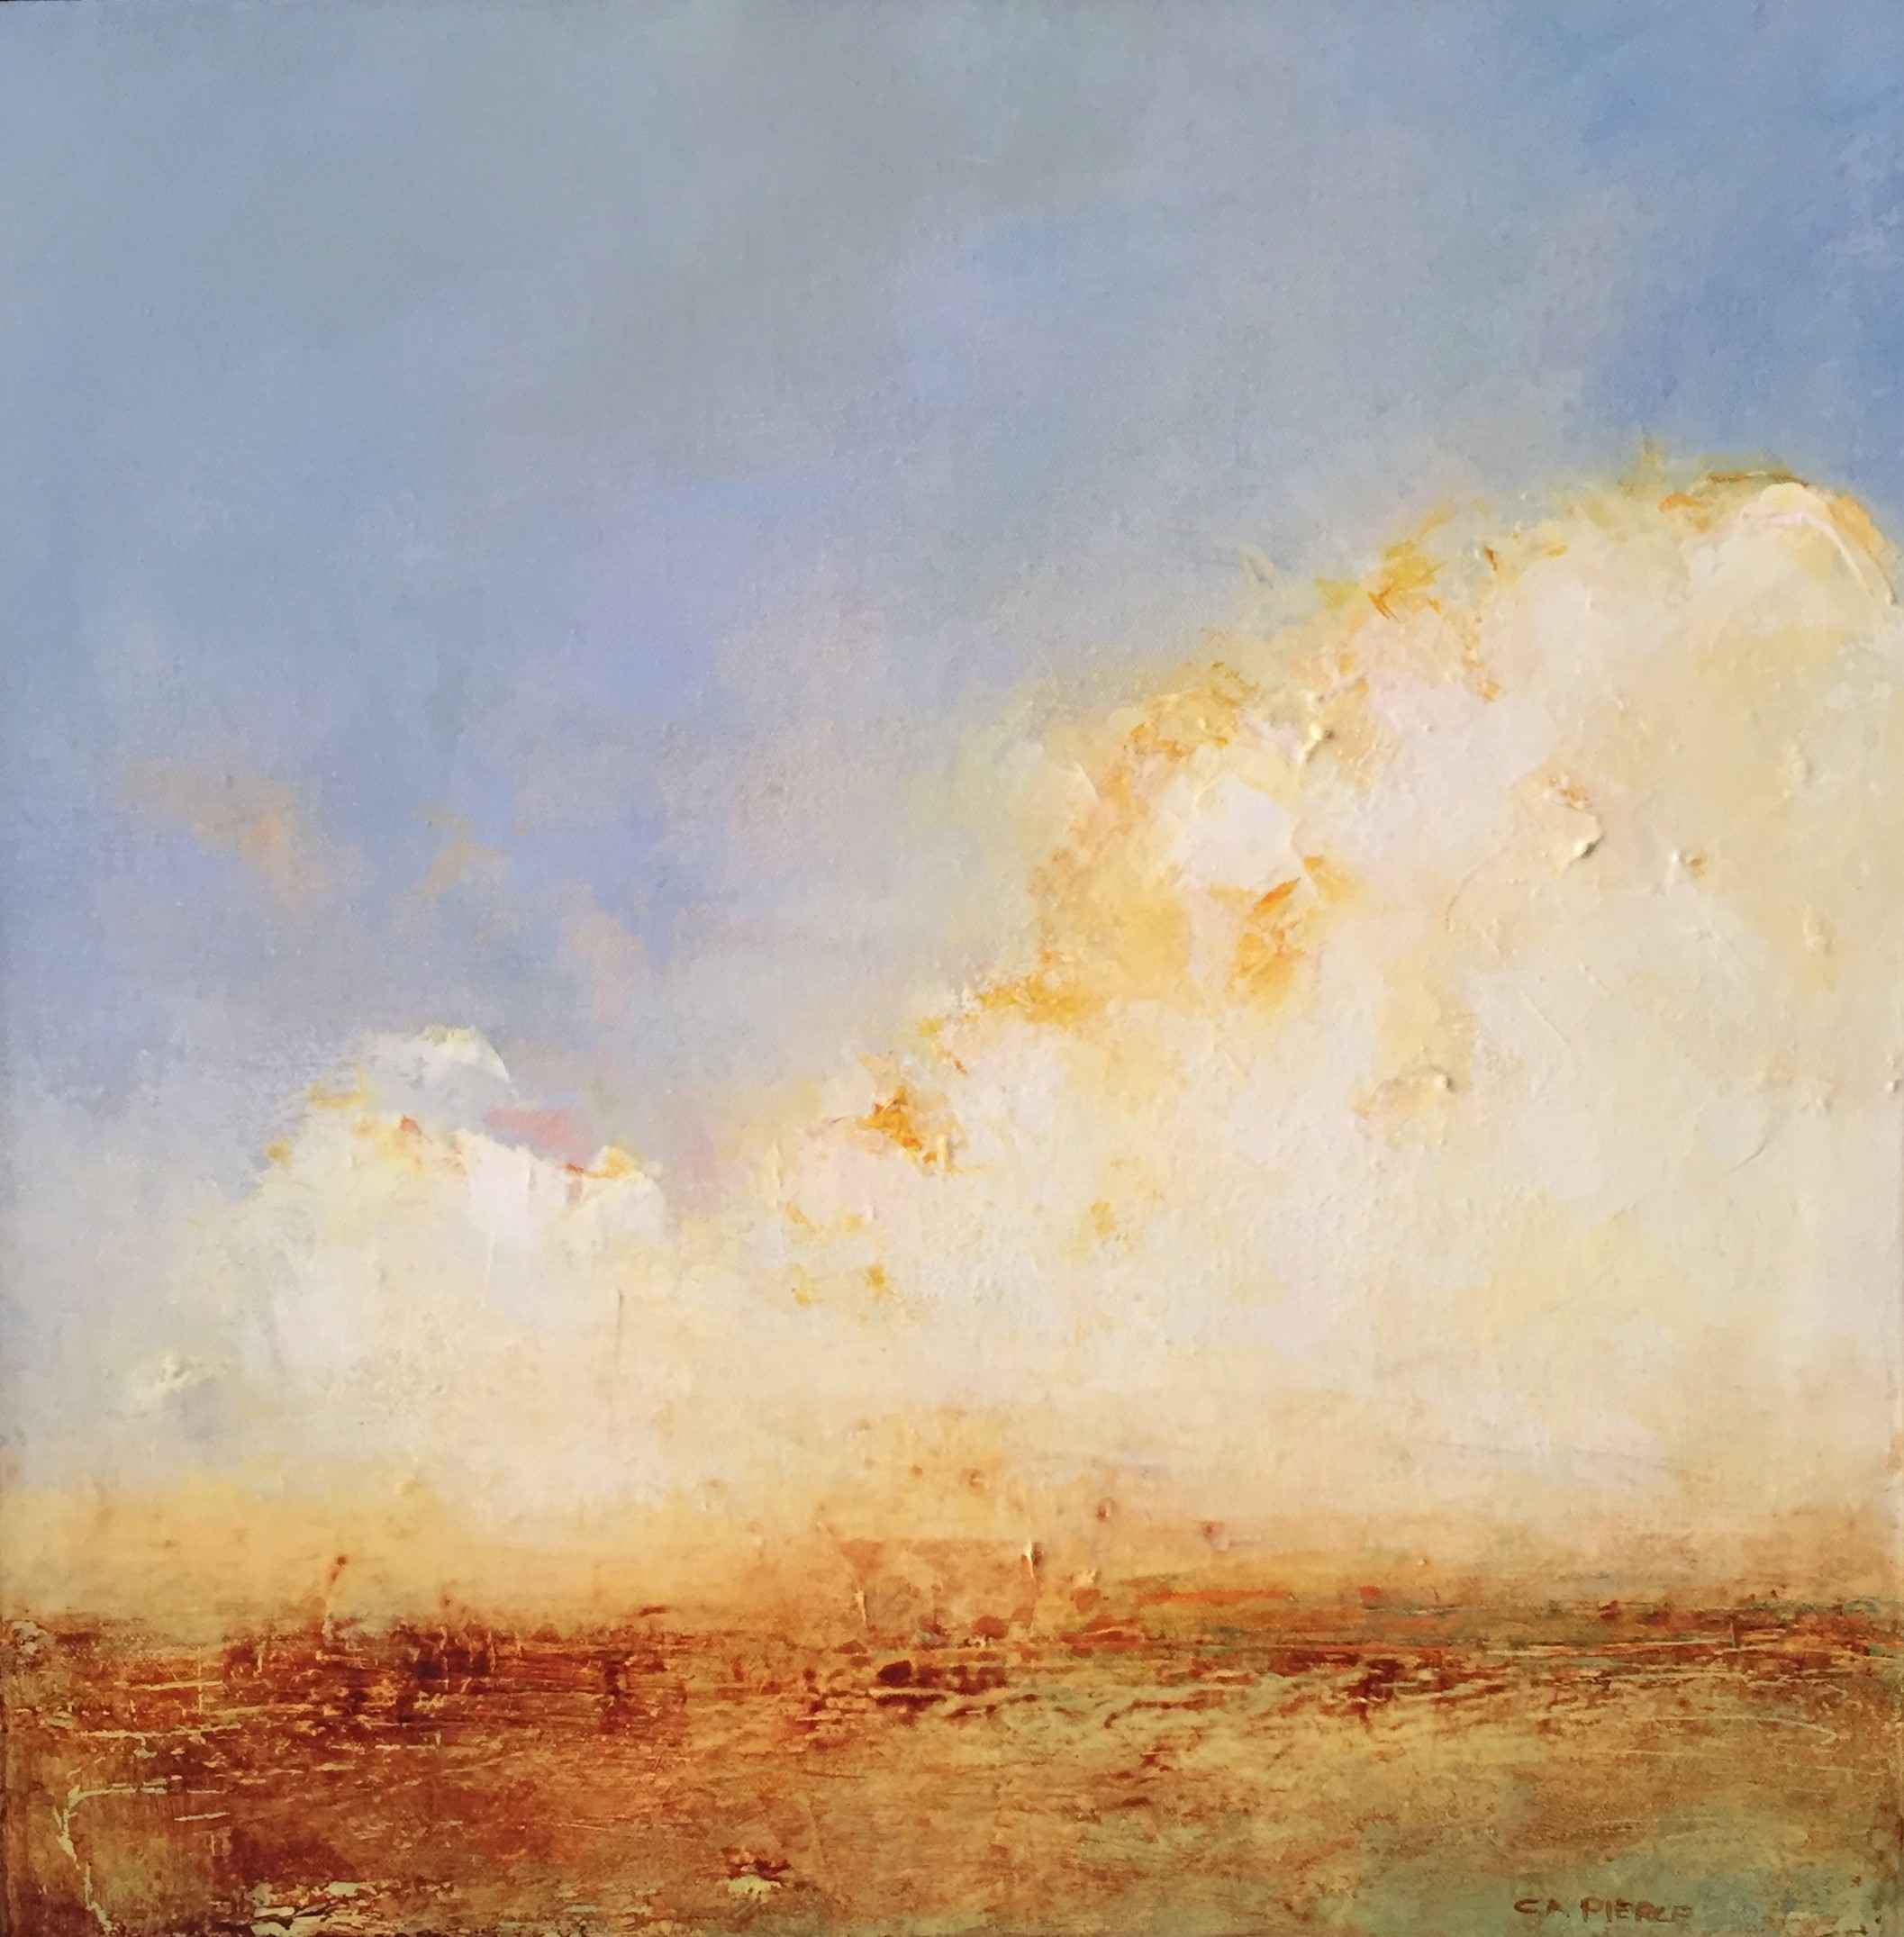 Rolling In by  C.A. Pierce - Masterpiece Online